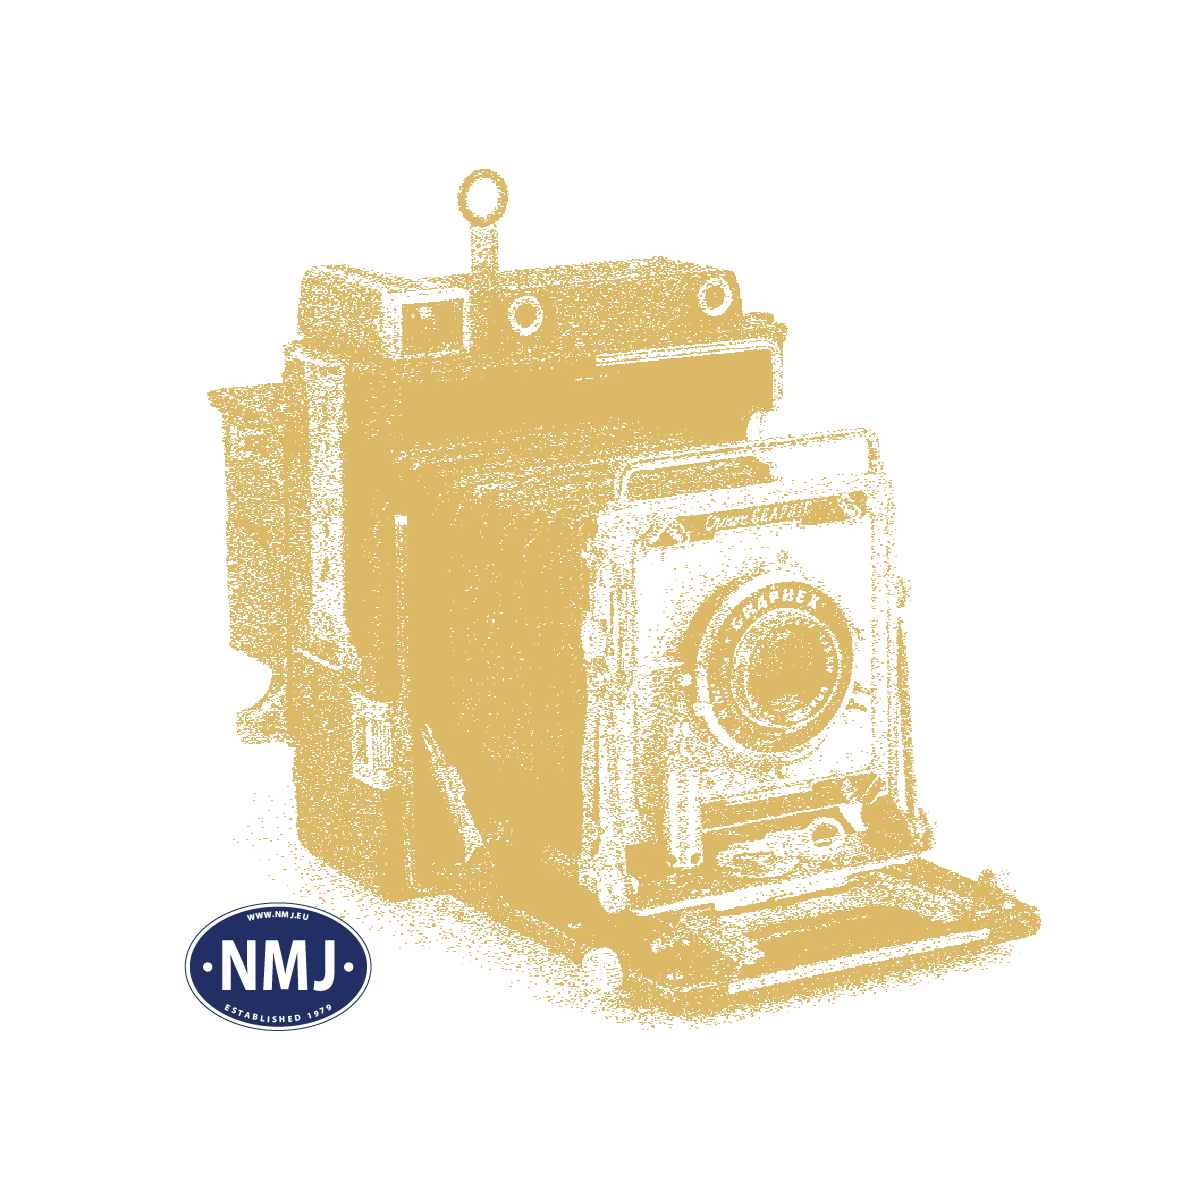 NMJT87.201 - NMJ Topline NSB El11b.2148, rotbraun, DC